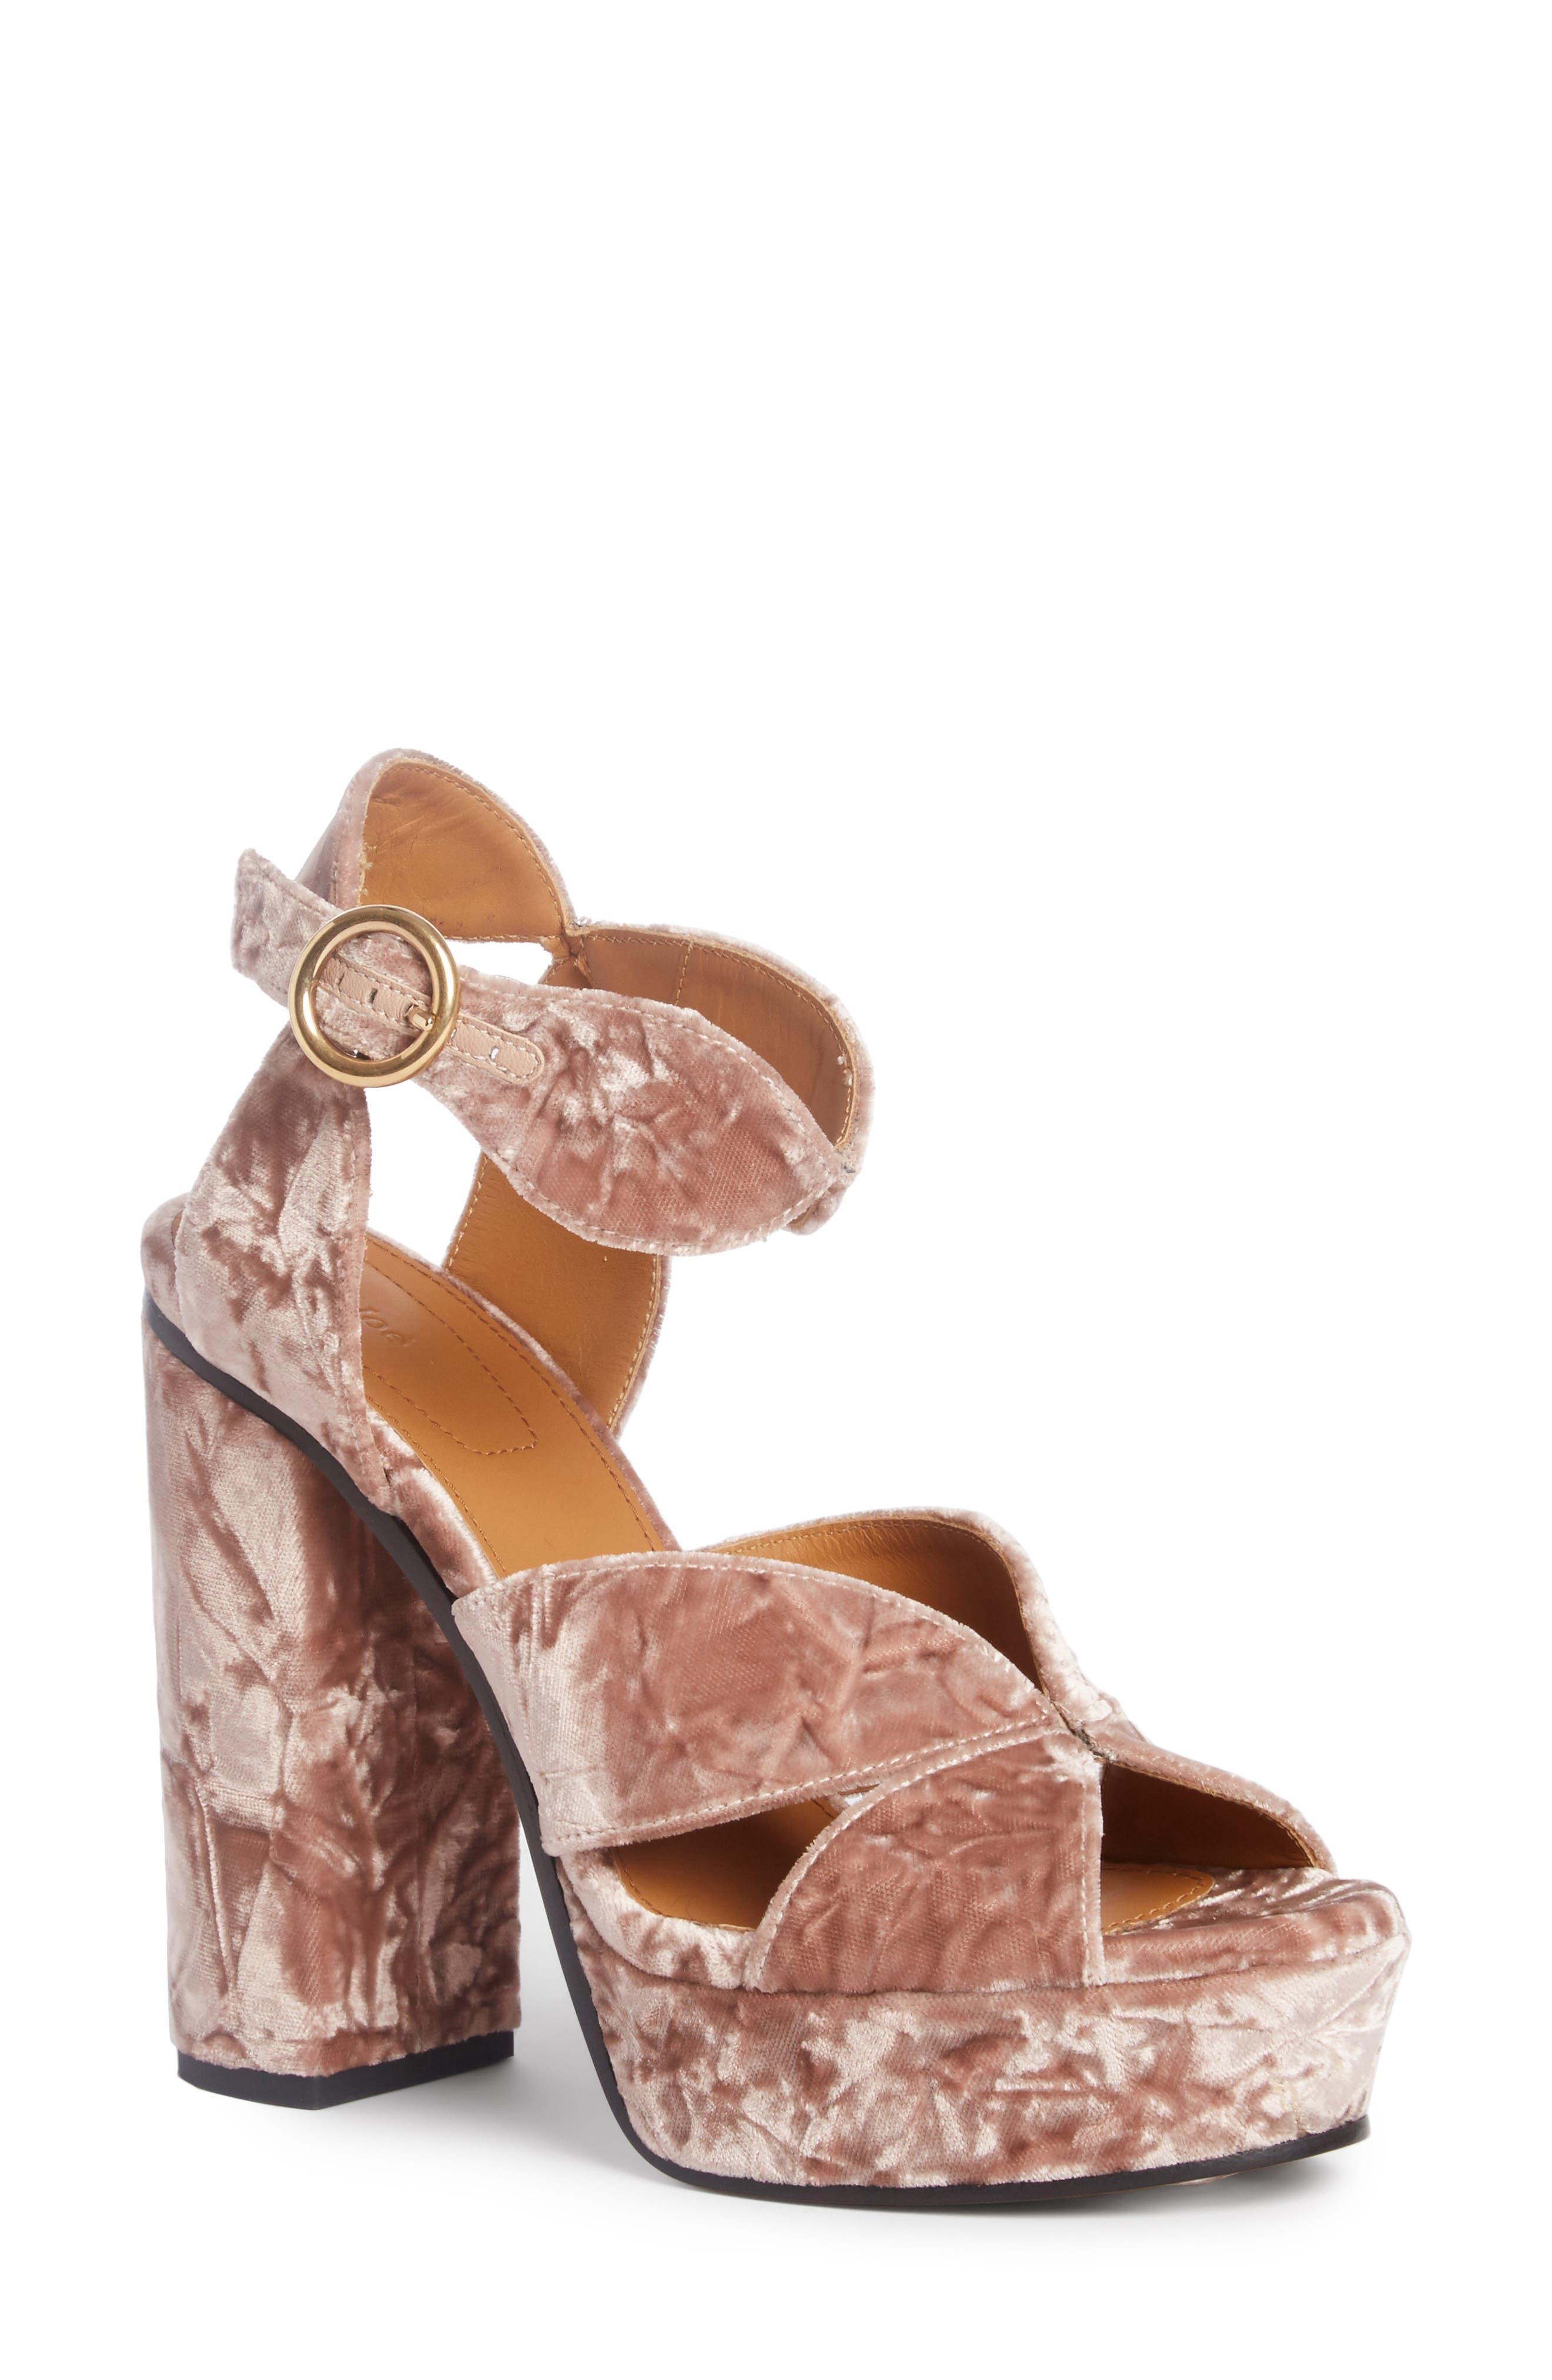 Alternate Image 1 Selected - Chloé Graphic Leaves Platform Sandal (Women)